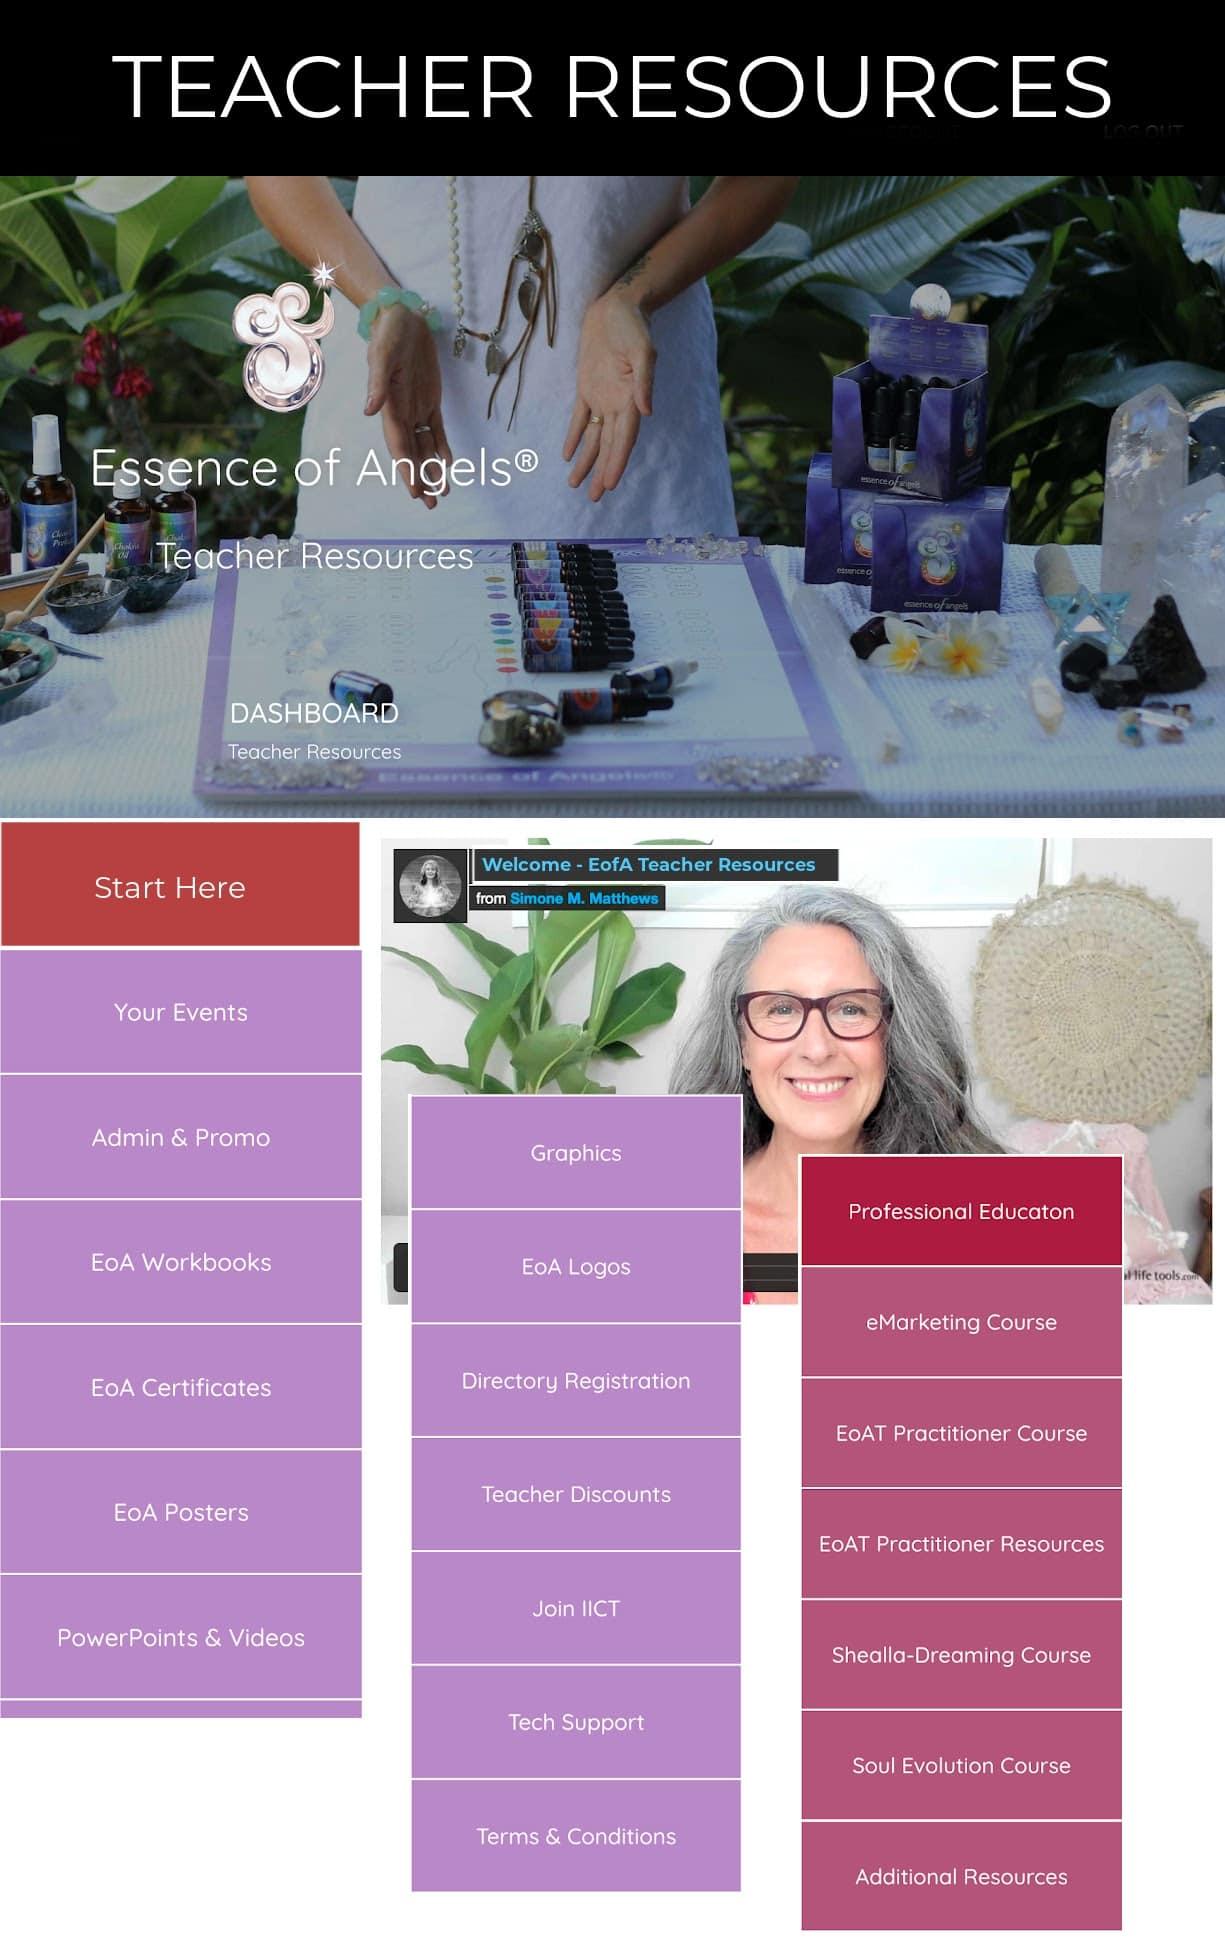 Essence of Angels TEACHER Resources New Platform HOME new